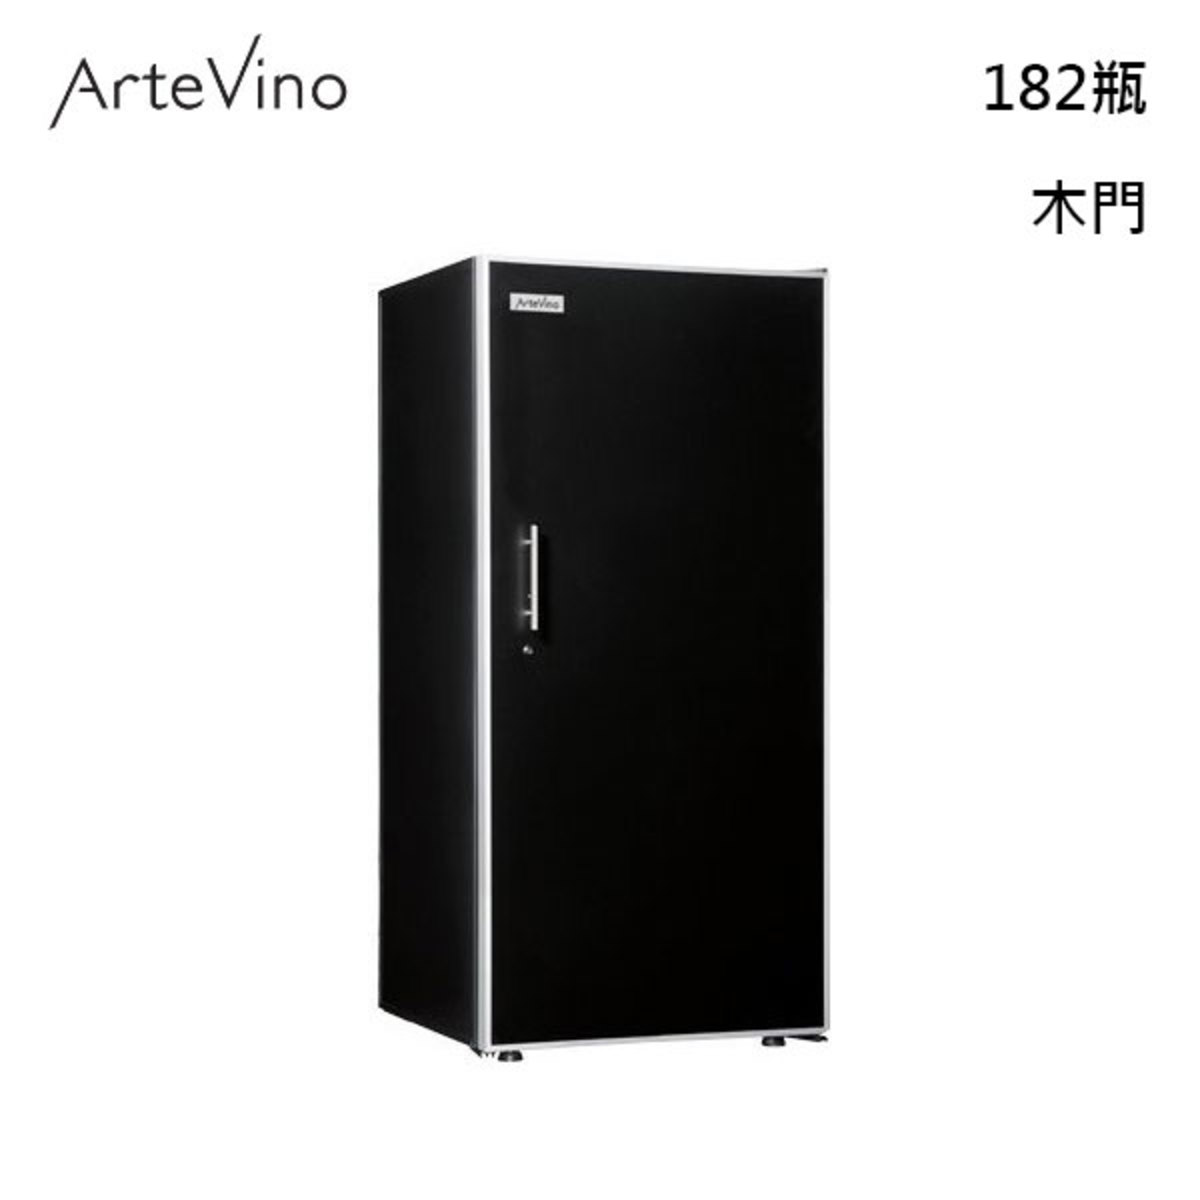 Artevino OXMIT182NPD 單溫 木門酒櫃 182瓶